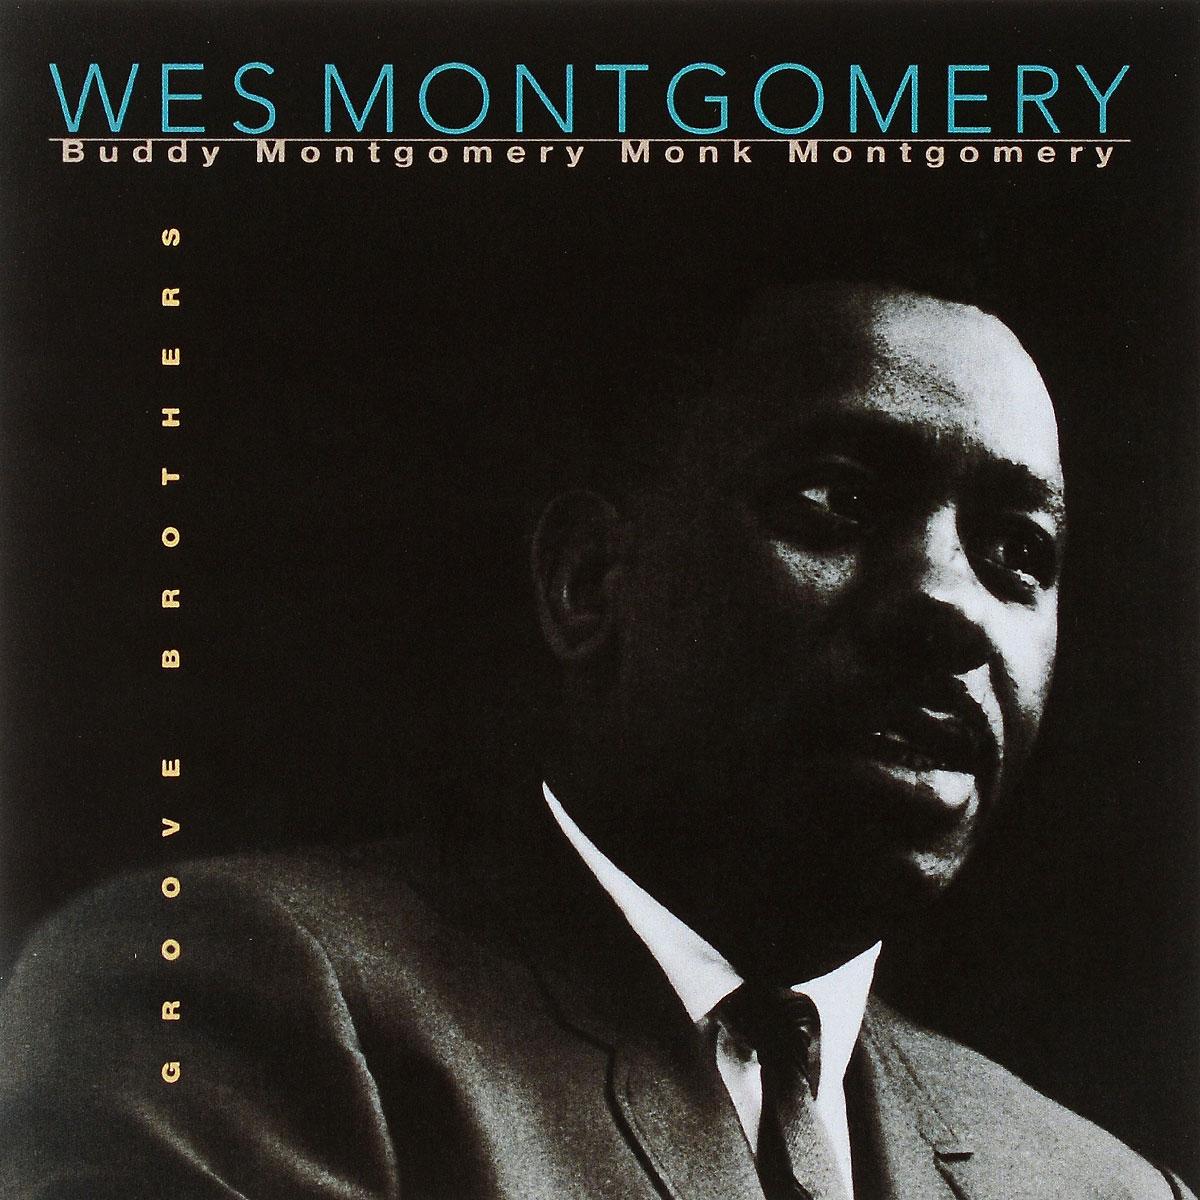 Уэс Монтгомери Wes Montgomery. Groove Brothers уэс монтгомери wes montgomery bumpin lp